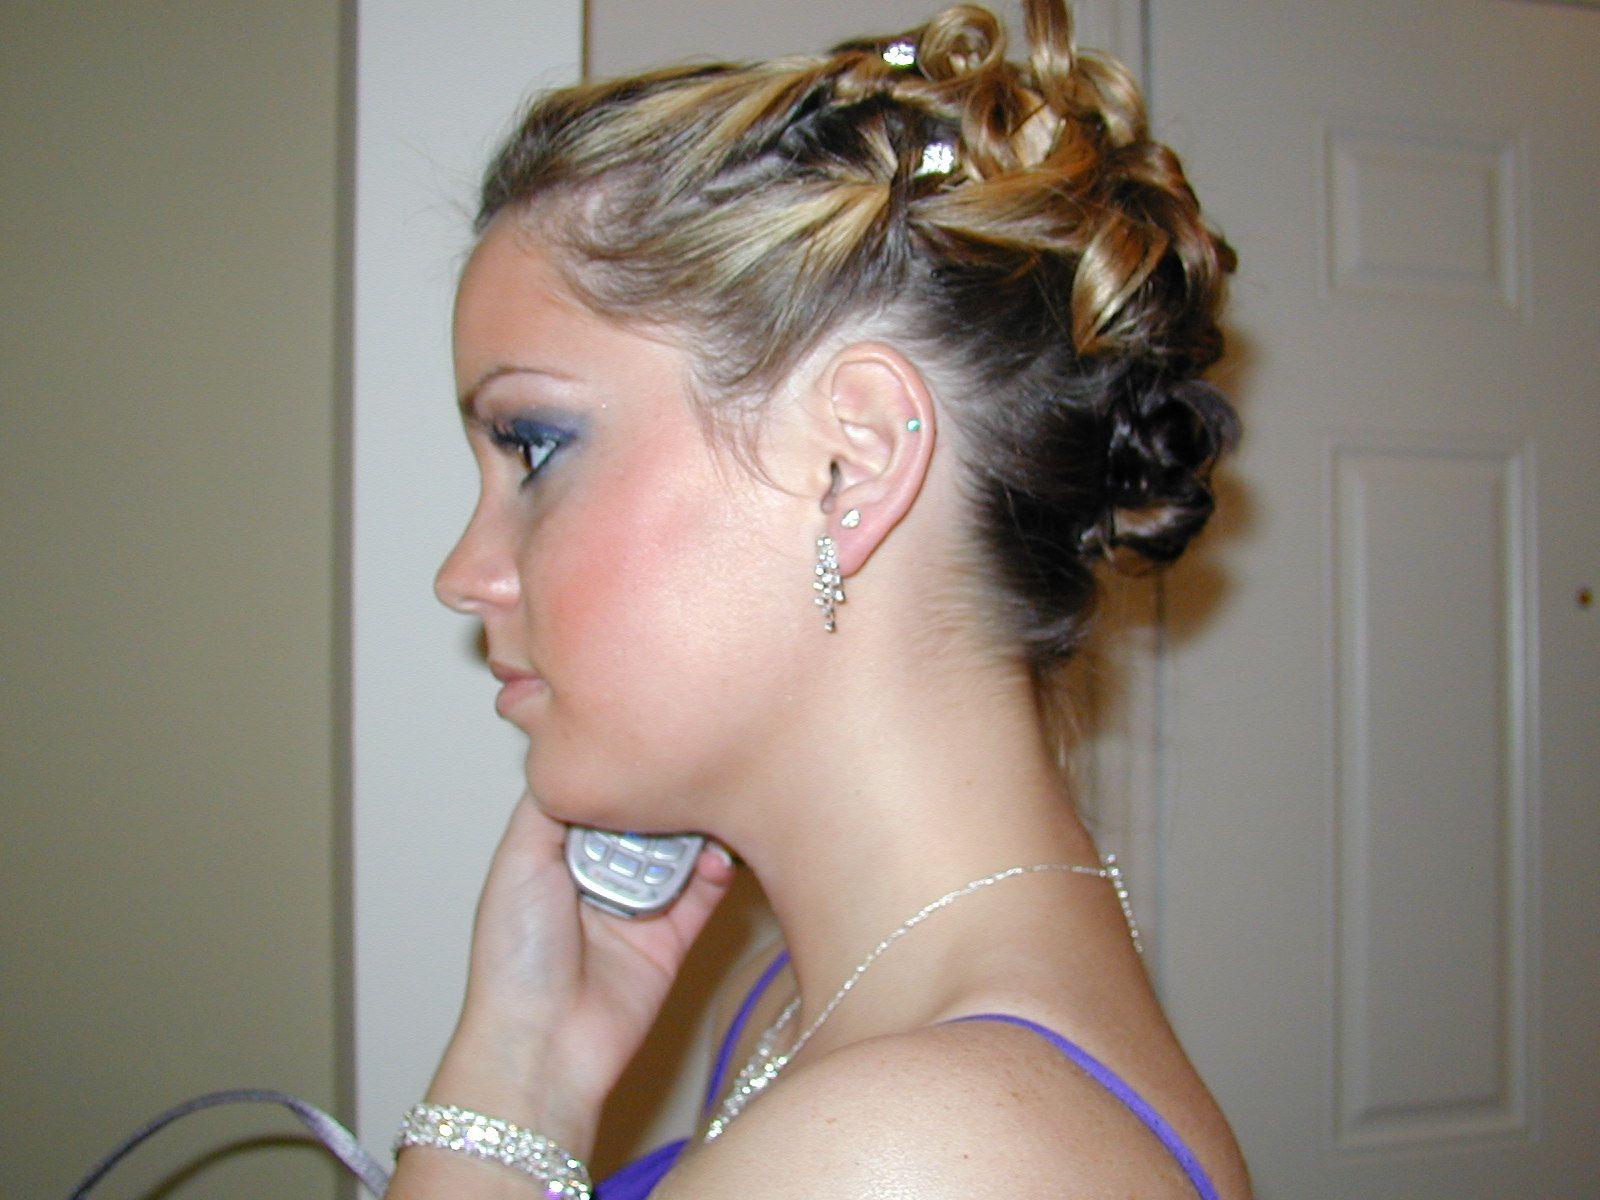 Prom Hairstyles For Medium Hair Medium Hairstyles Pinterest - Bun hairstyle games